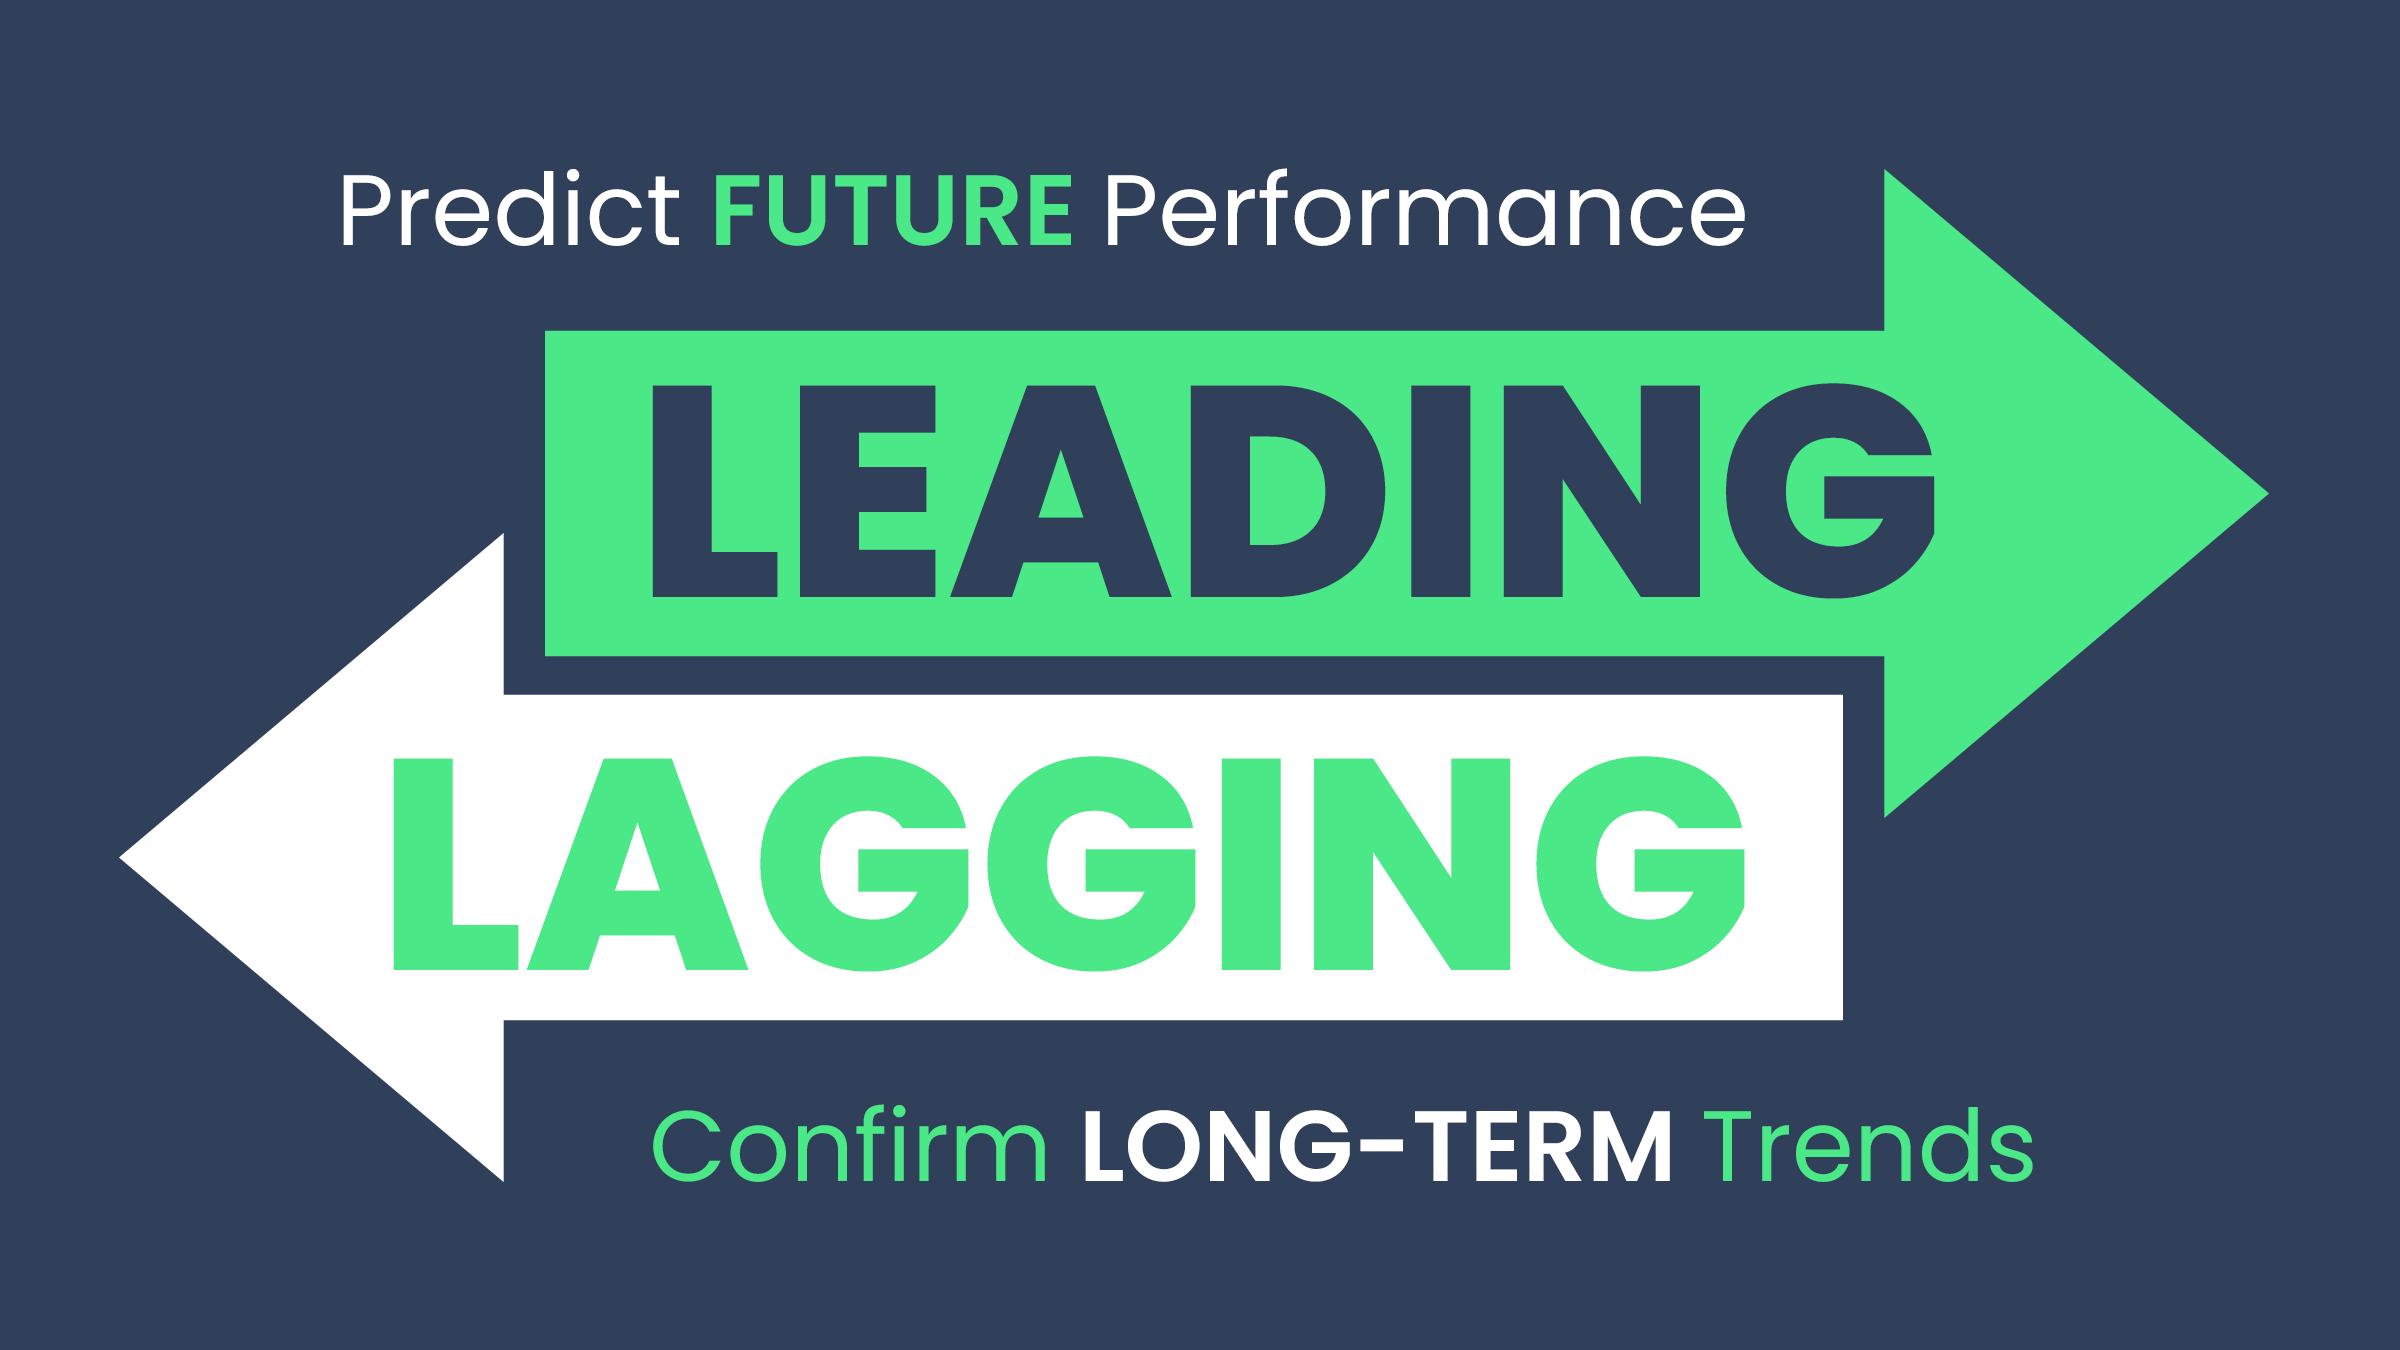 Leading Lagging-1